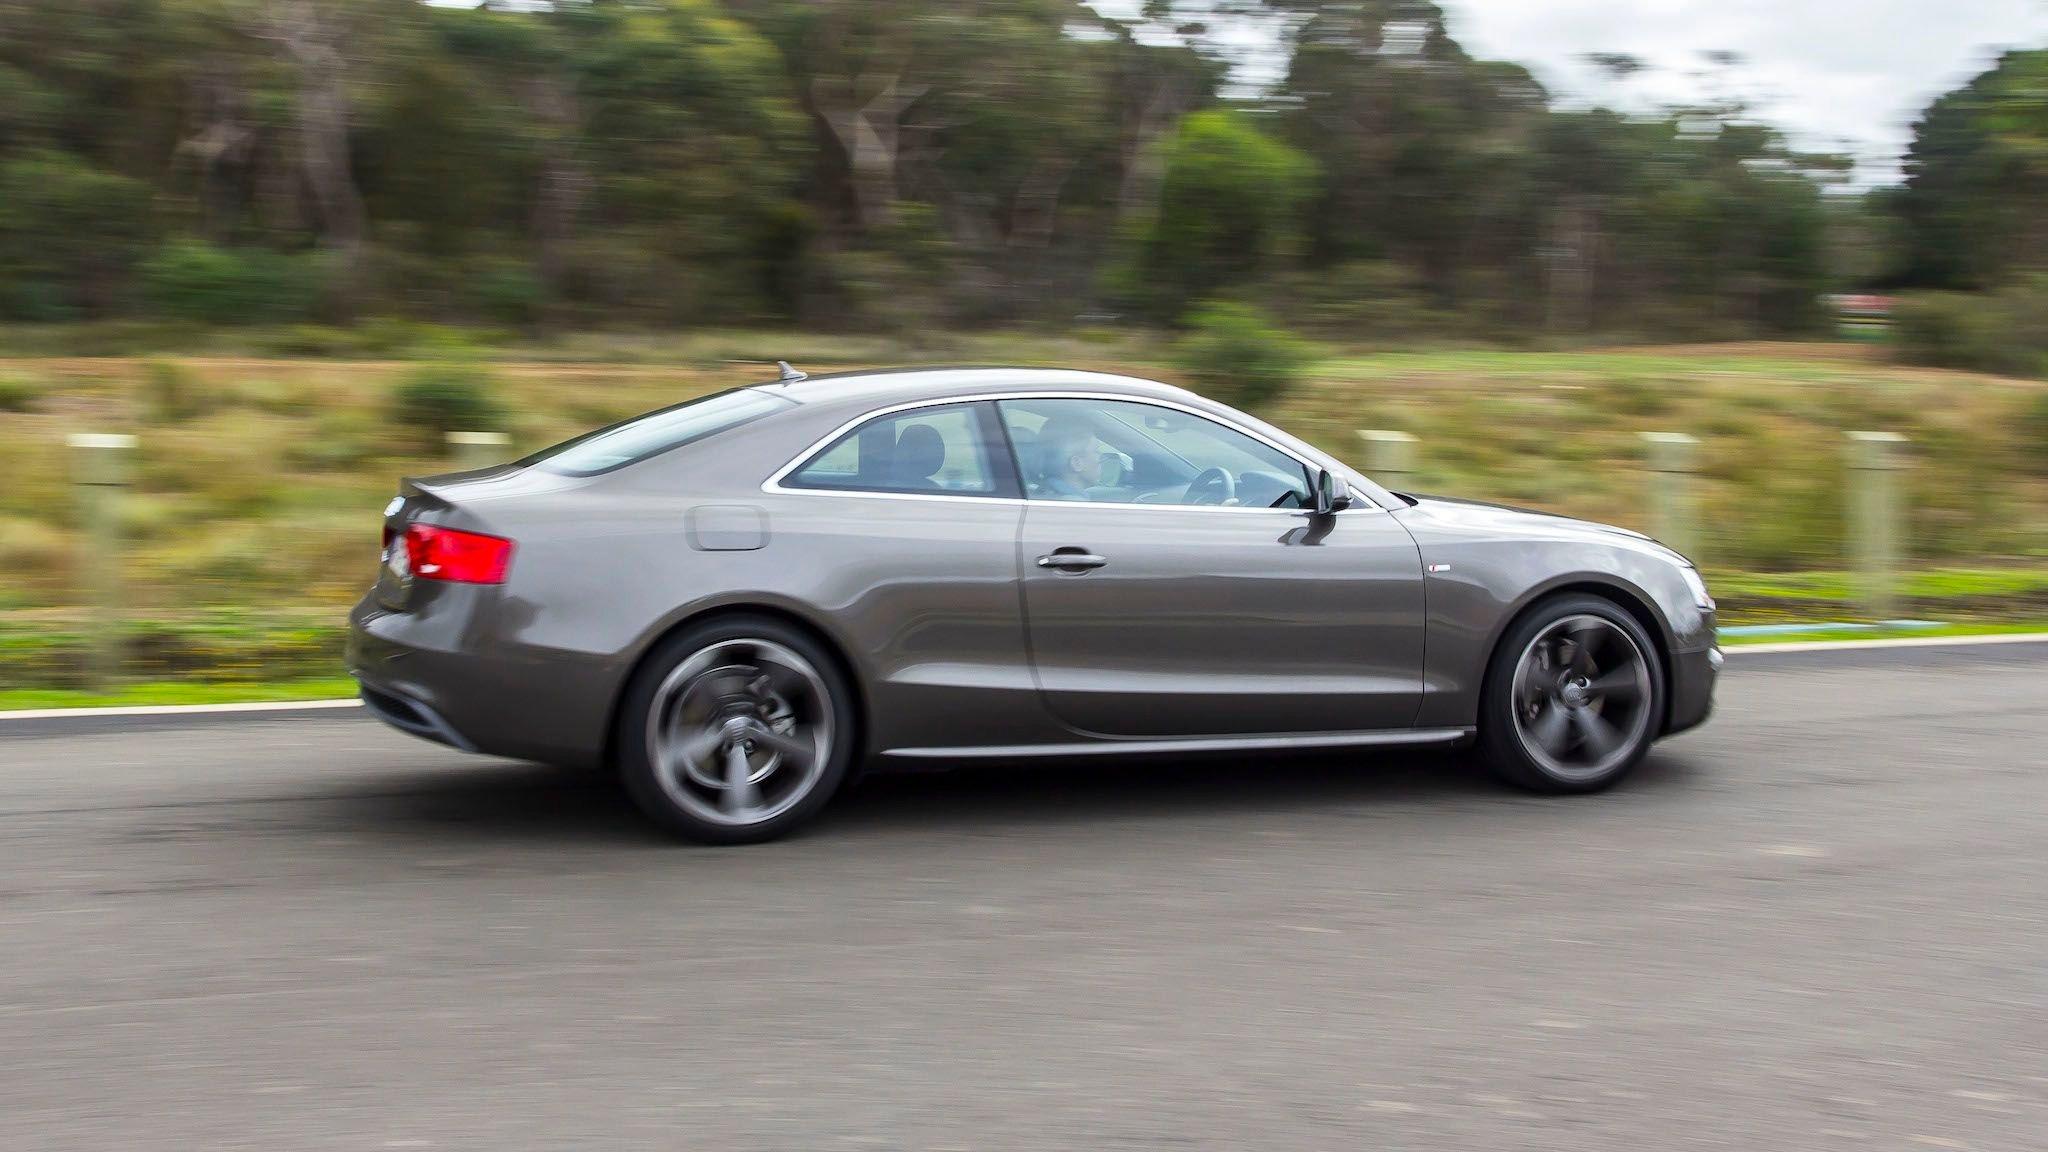 Audi A5 V Bmw 4 Series Comparison Review Photos 1 Of 44